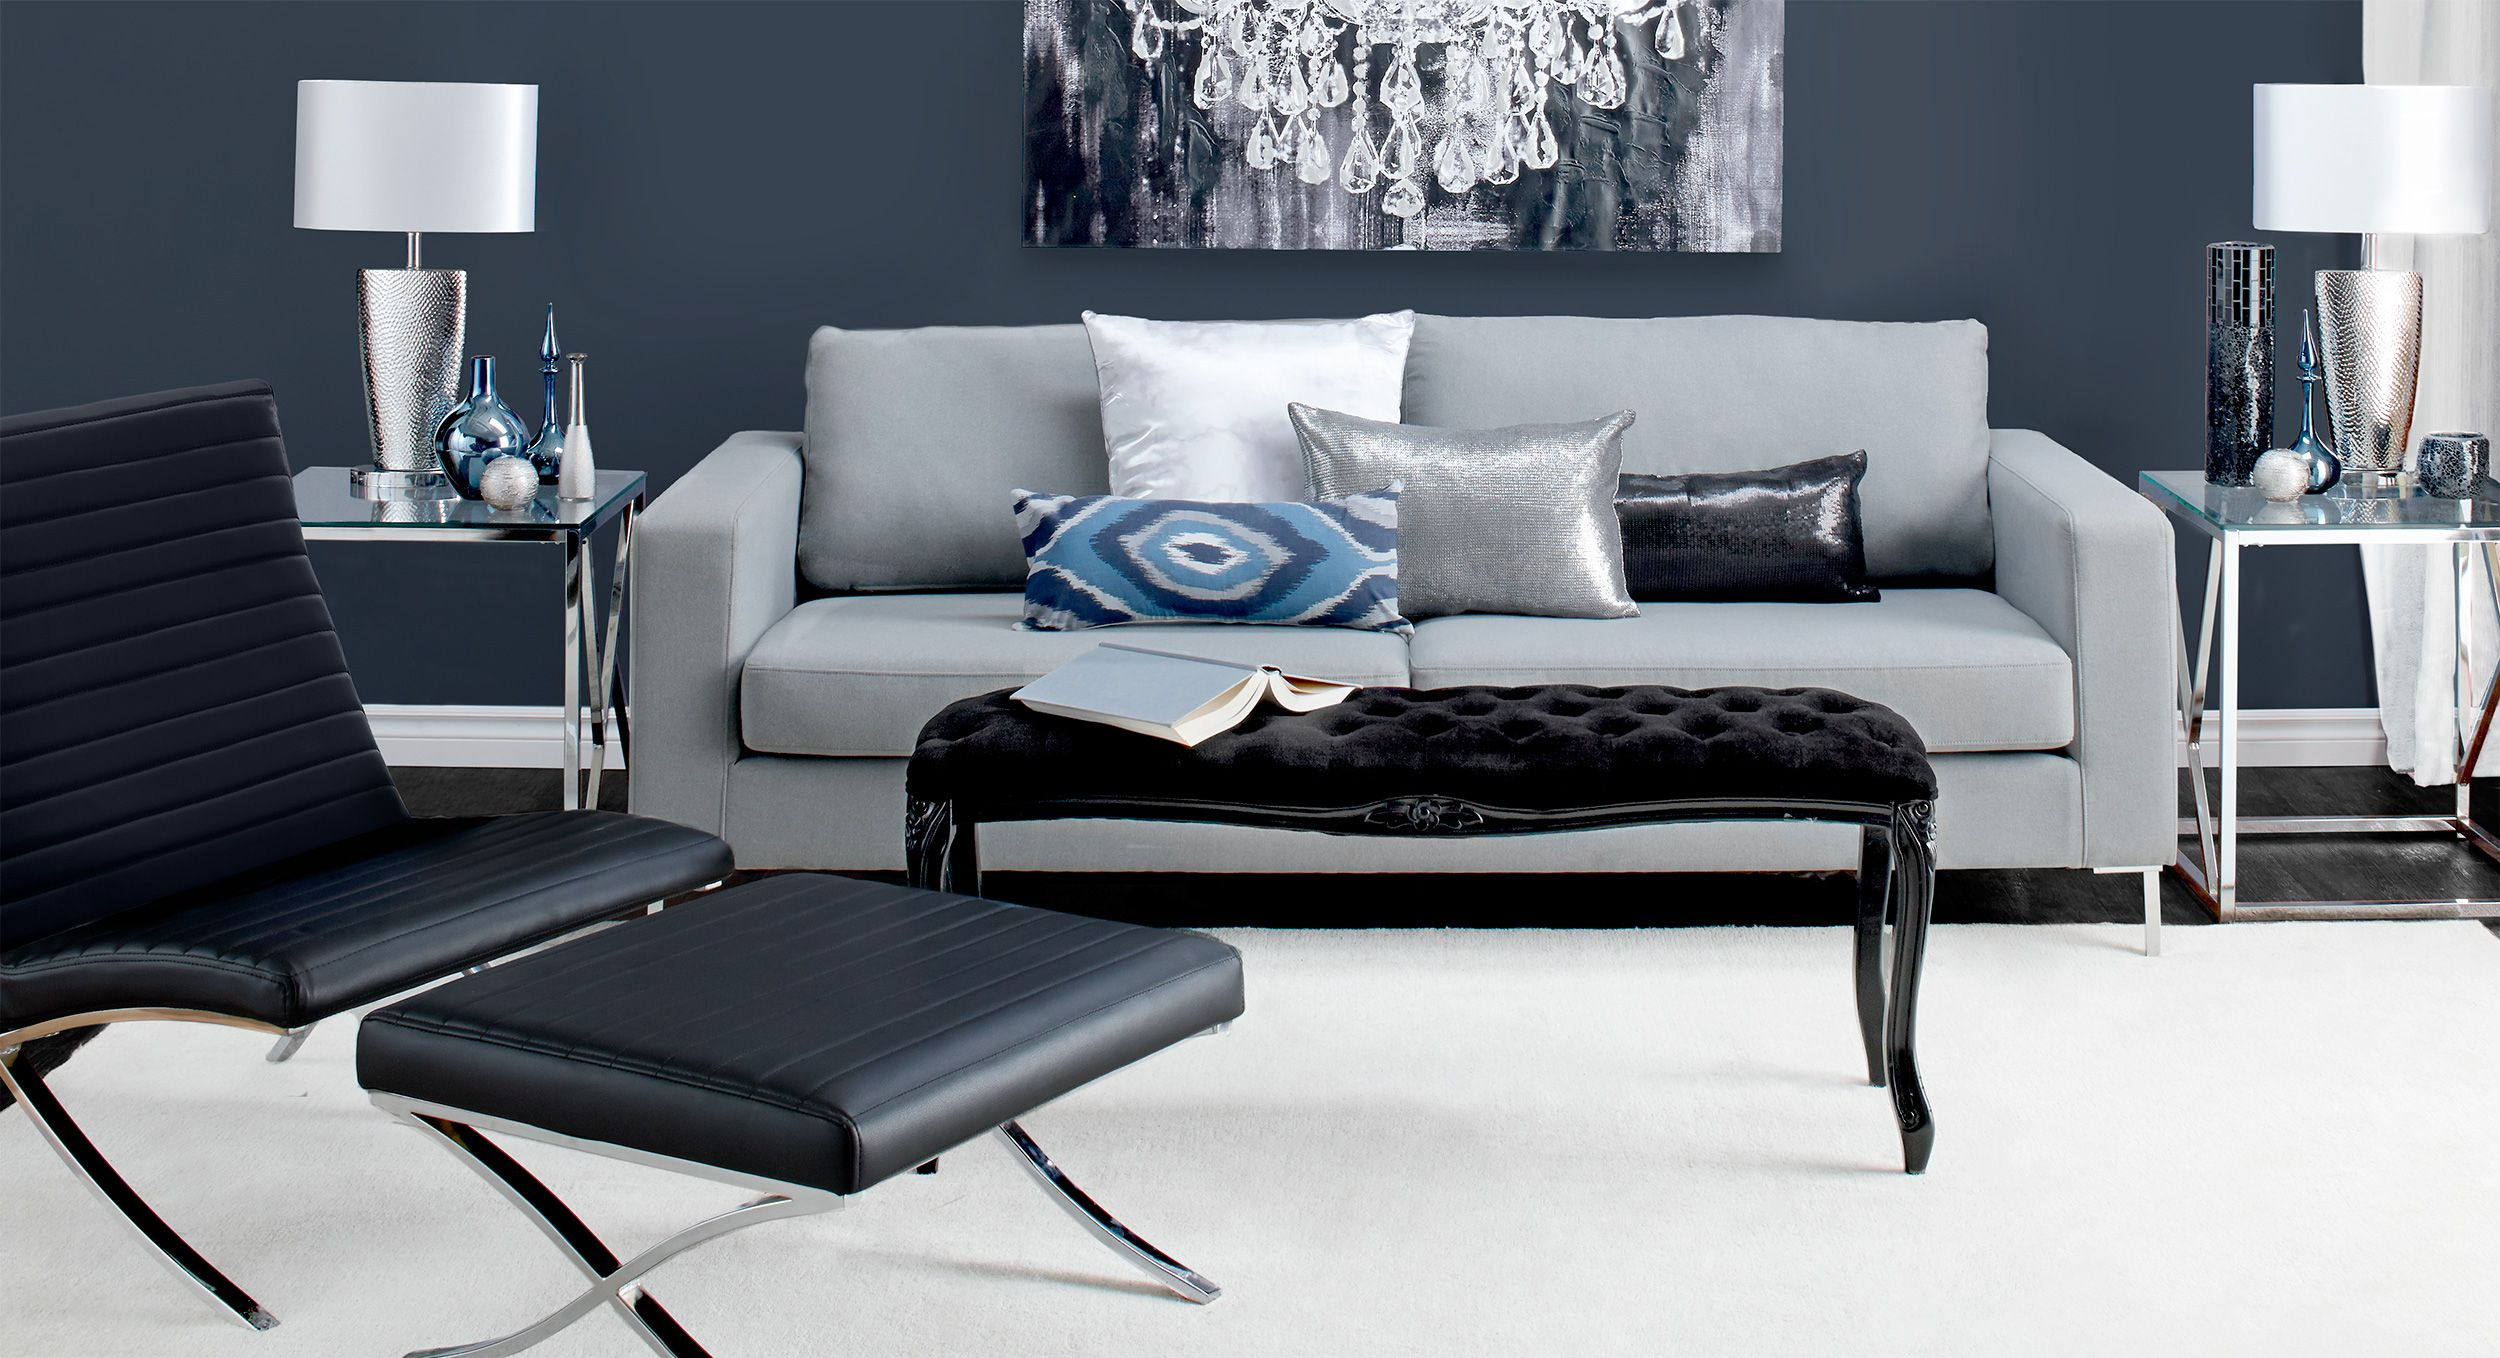 Arvika Living Room Decor Home decor, Home, Furniture